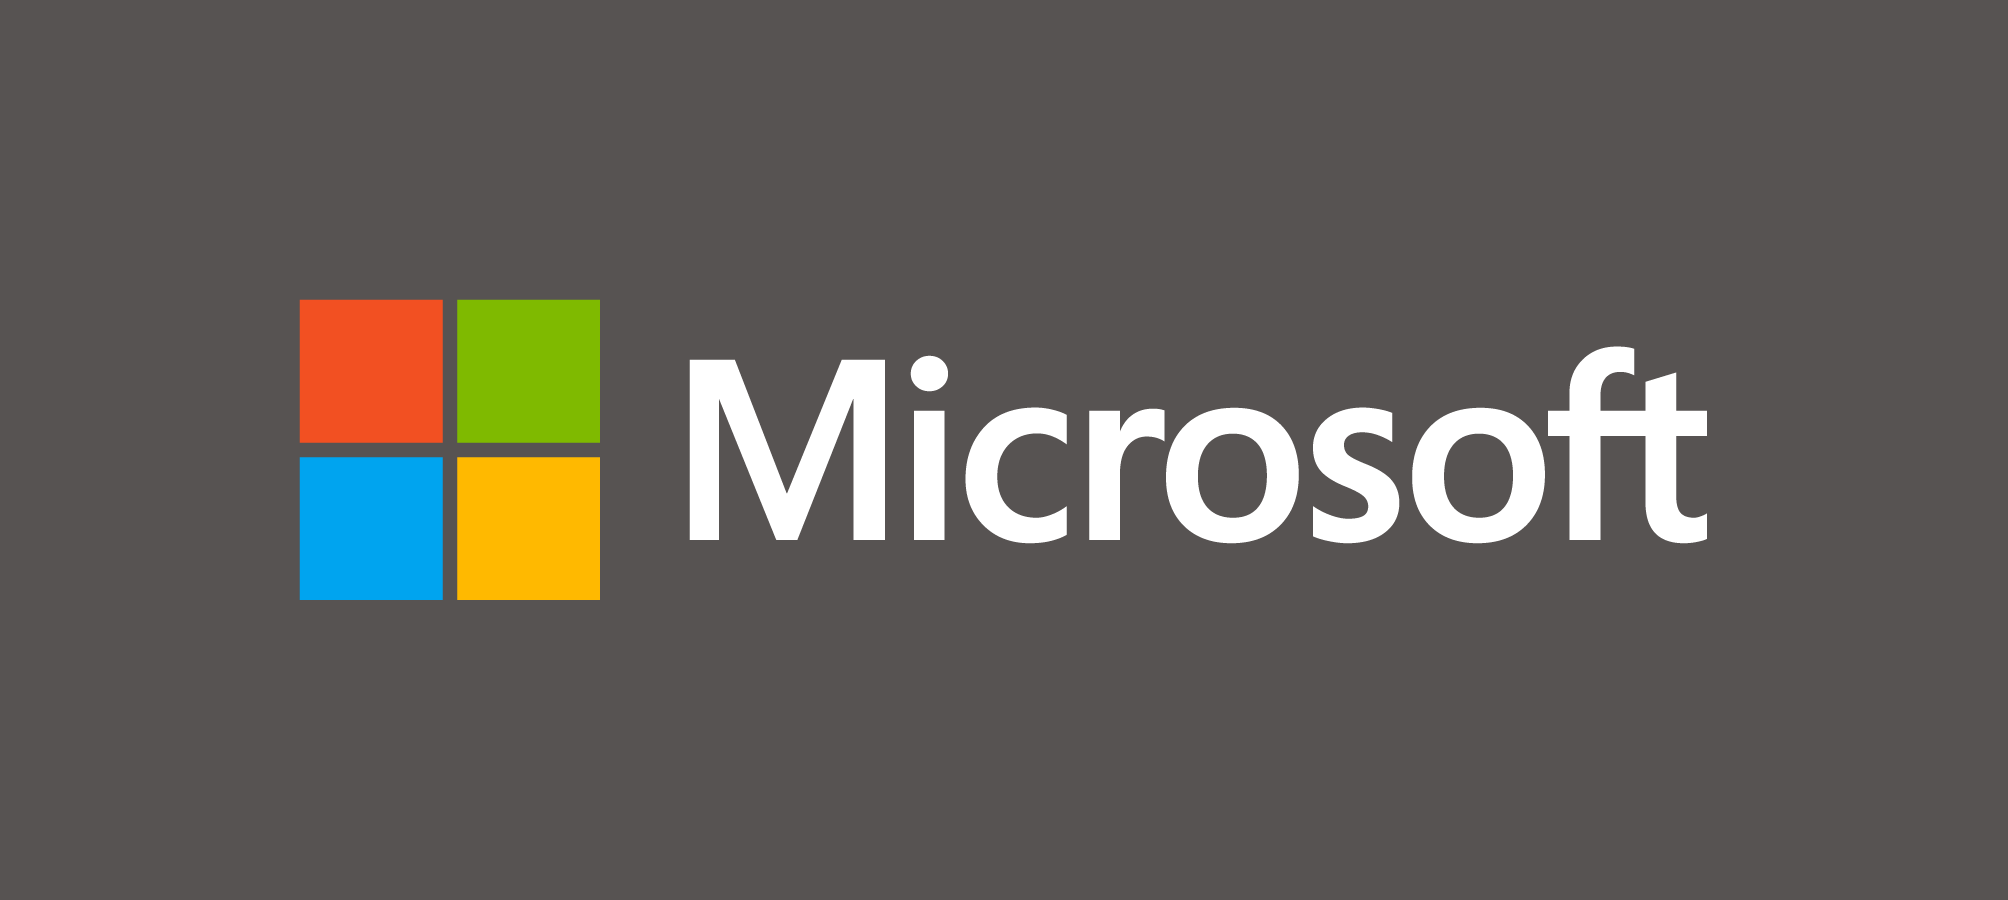 Microsoft-logo_rgb_wht.jpg.png